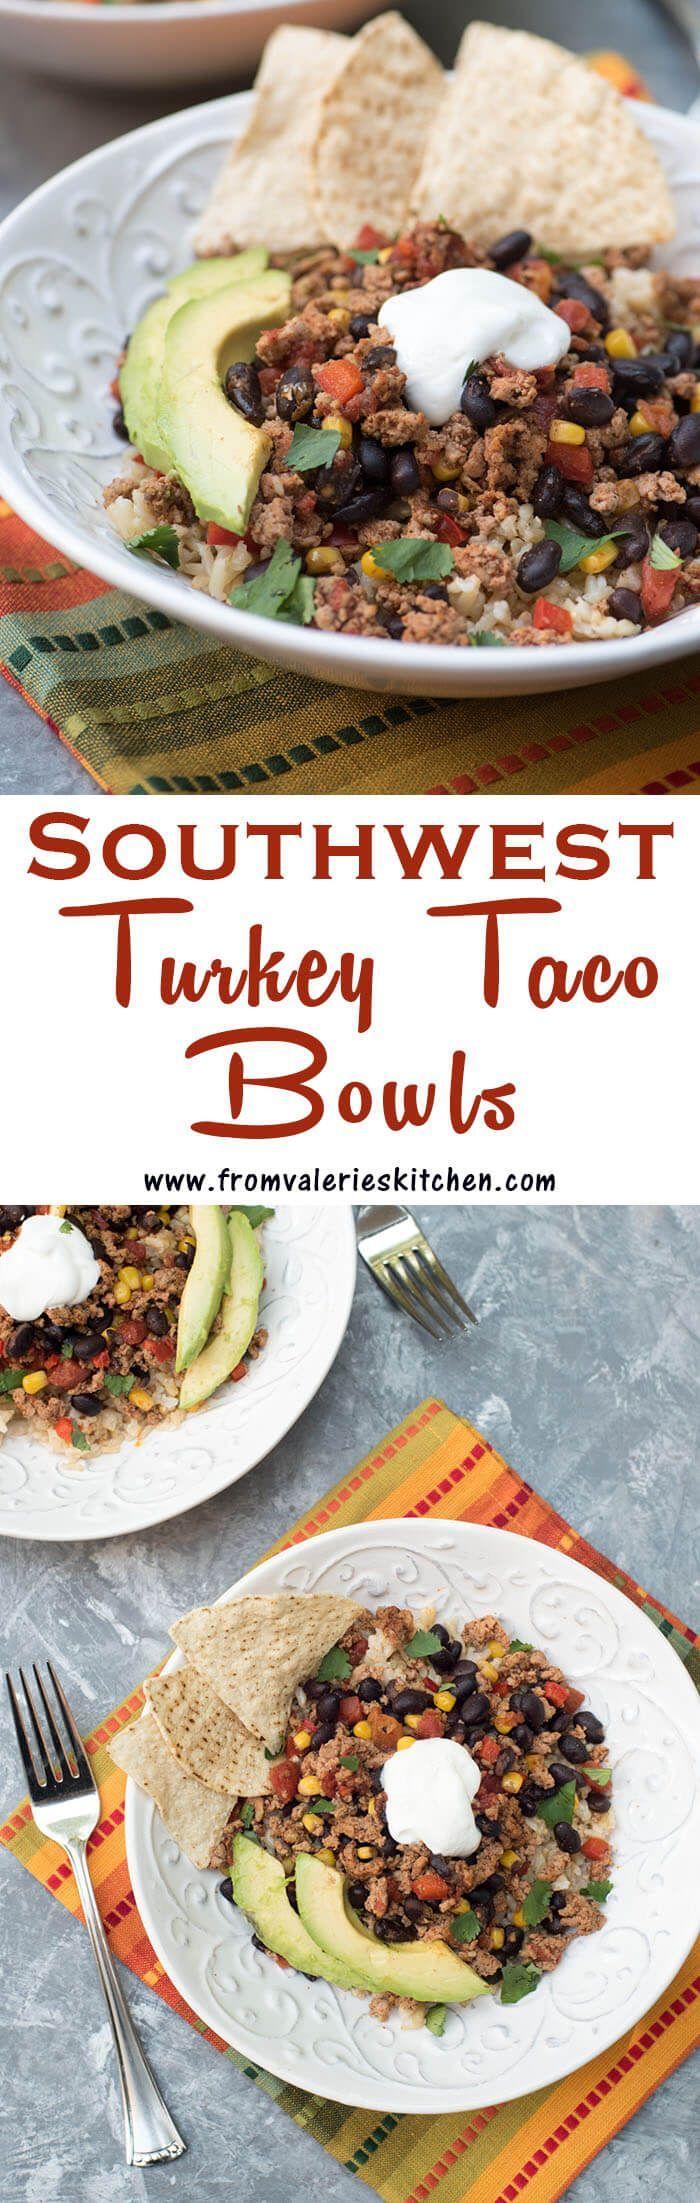 618 best easy quick meals for dinner images on pinterest Sw meals